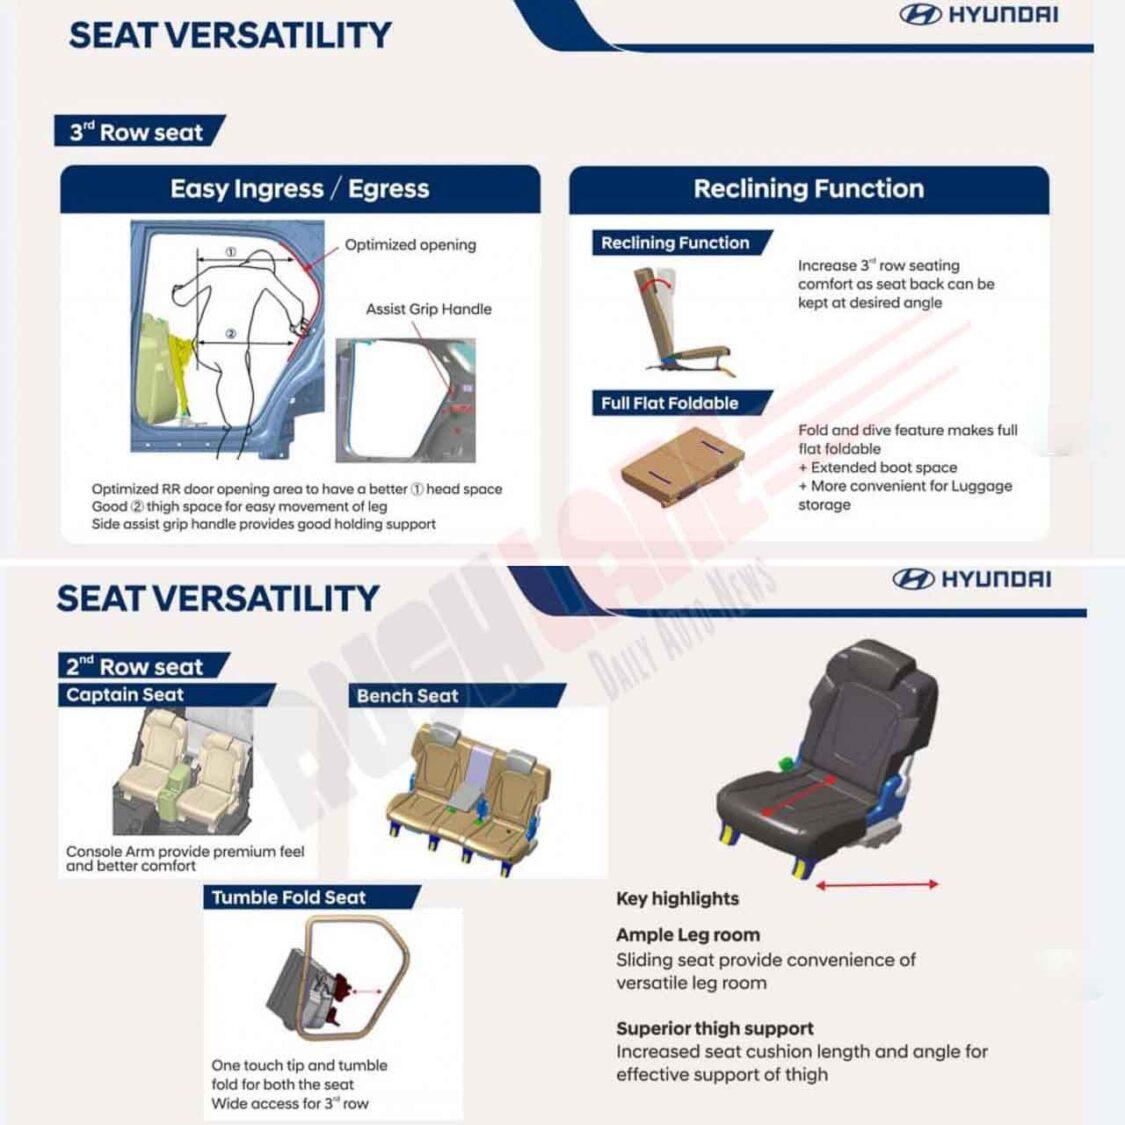 Hyundai Alcazar - Seat Versatility